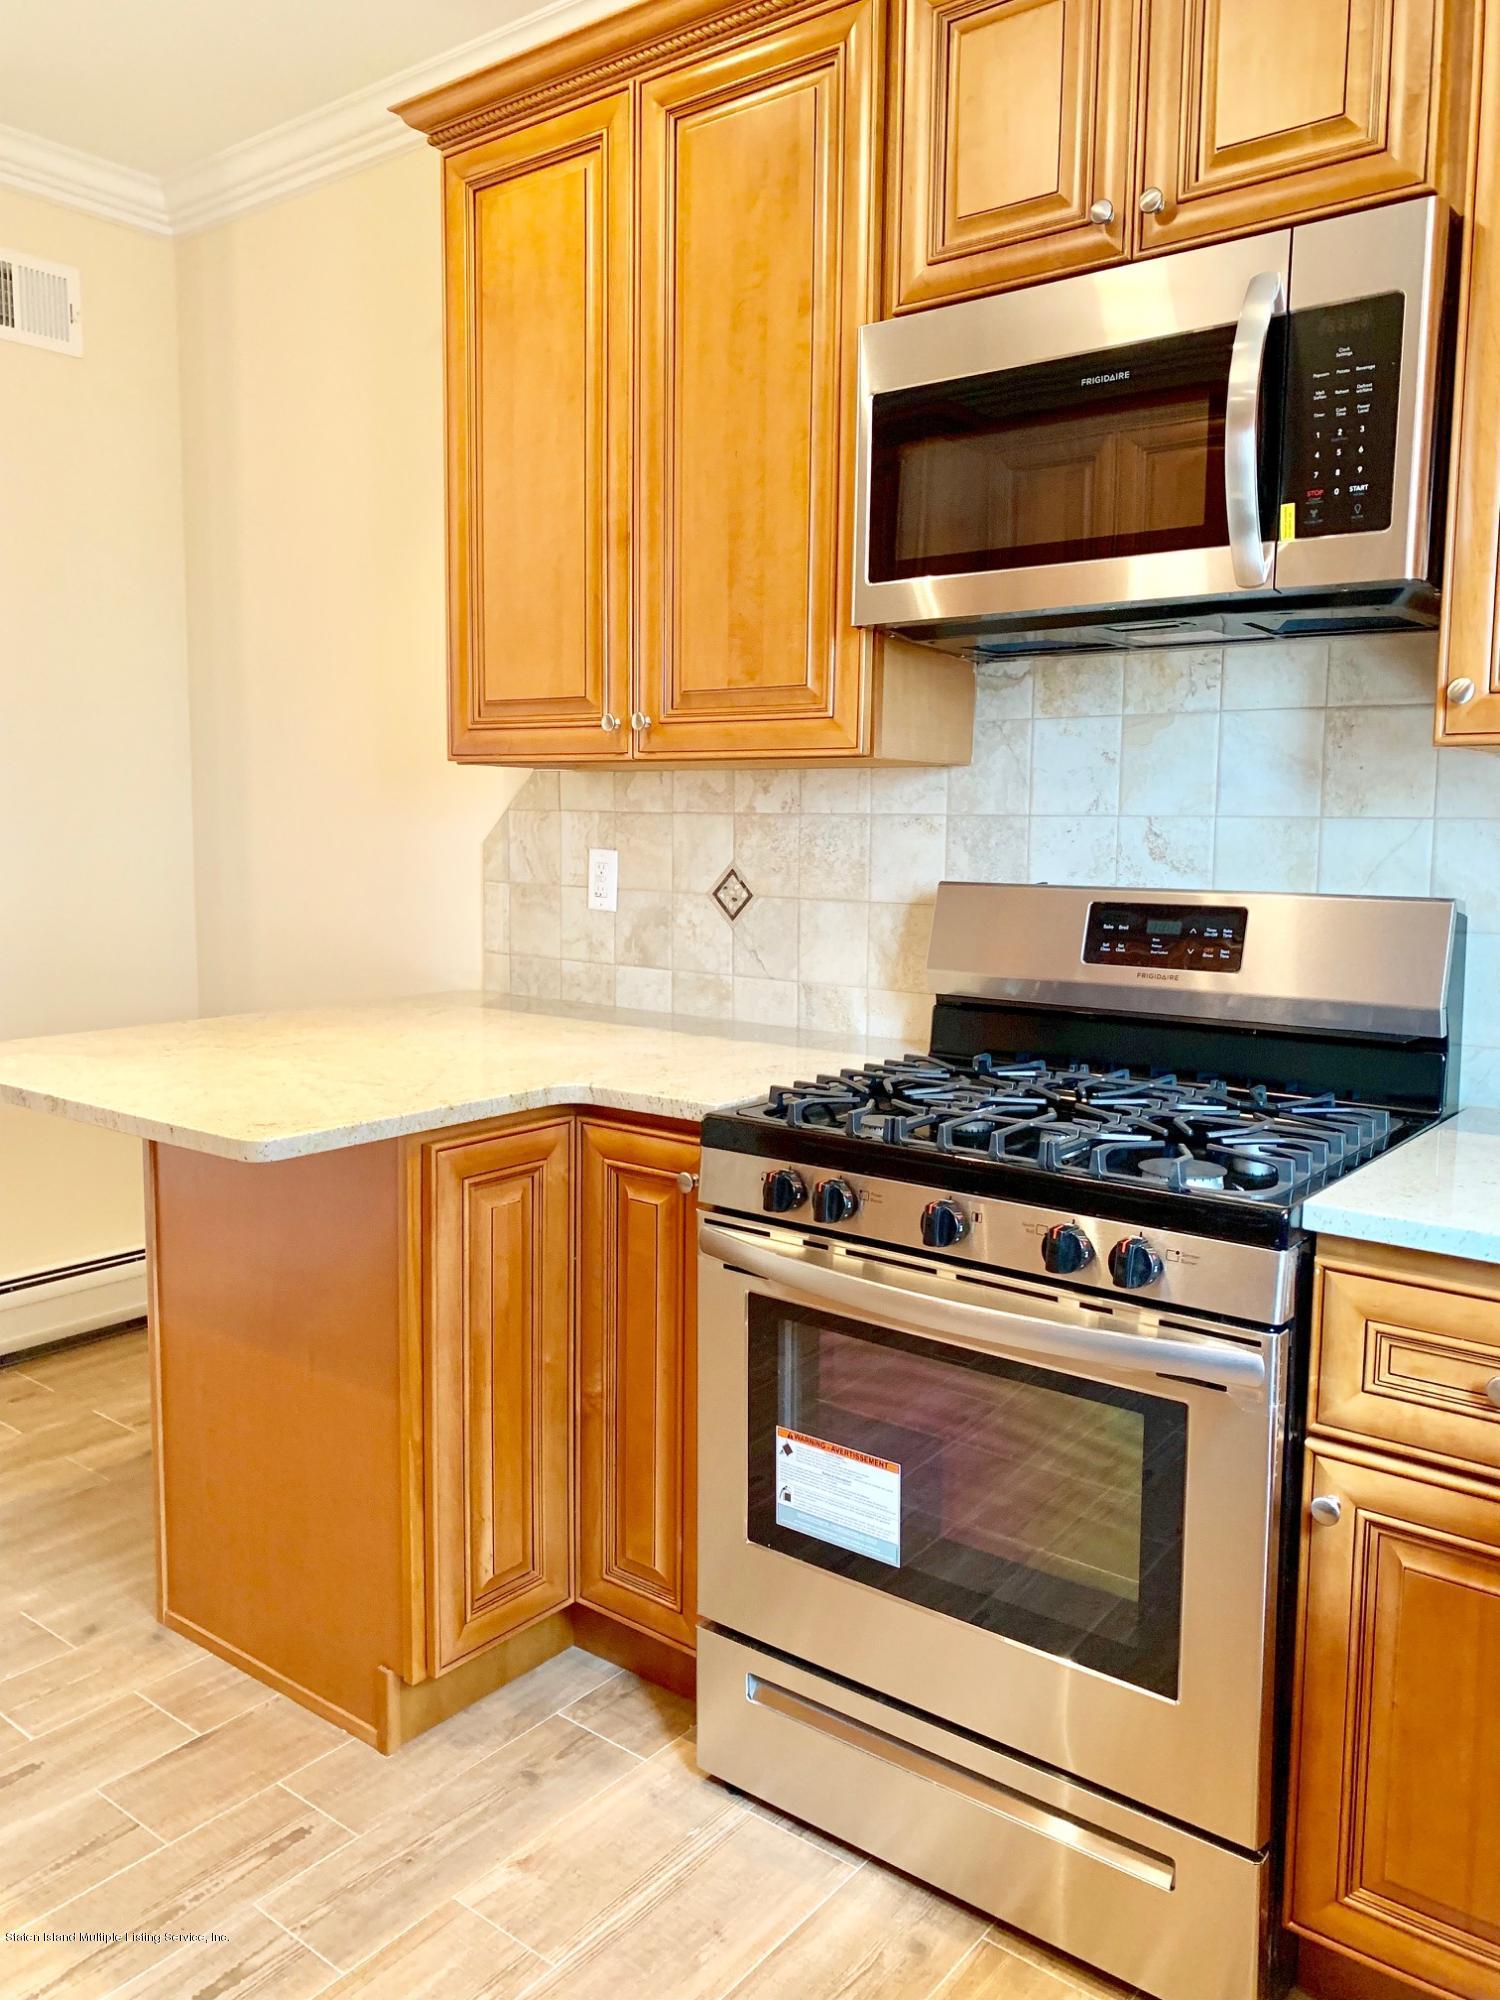 Two Family - Detached 30 Atlantic Avenue  Staten Island, NY 10304, MLS-1128623-10